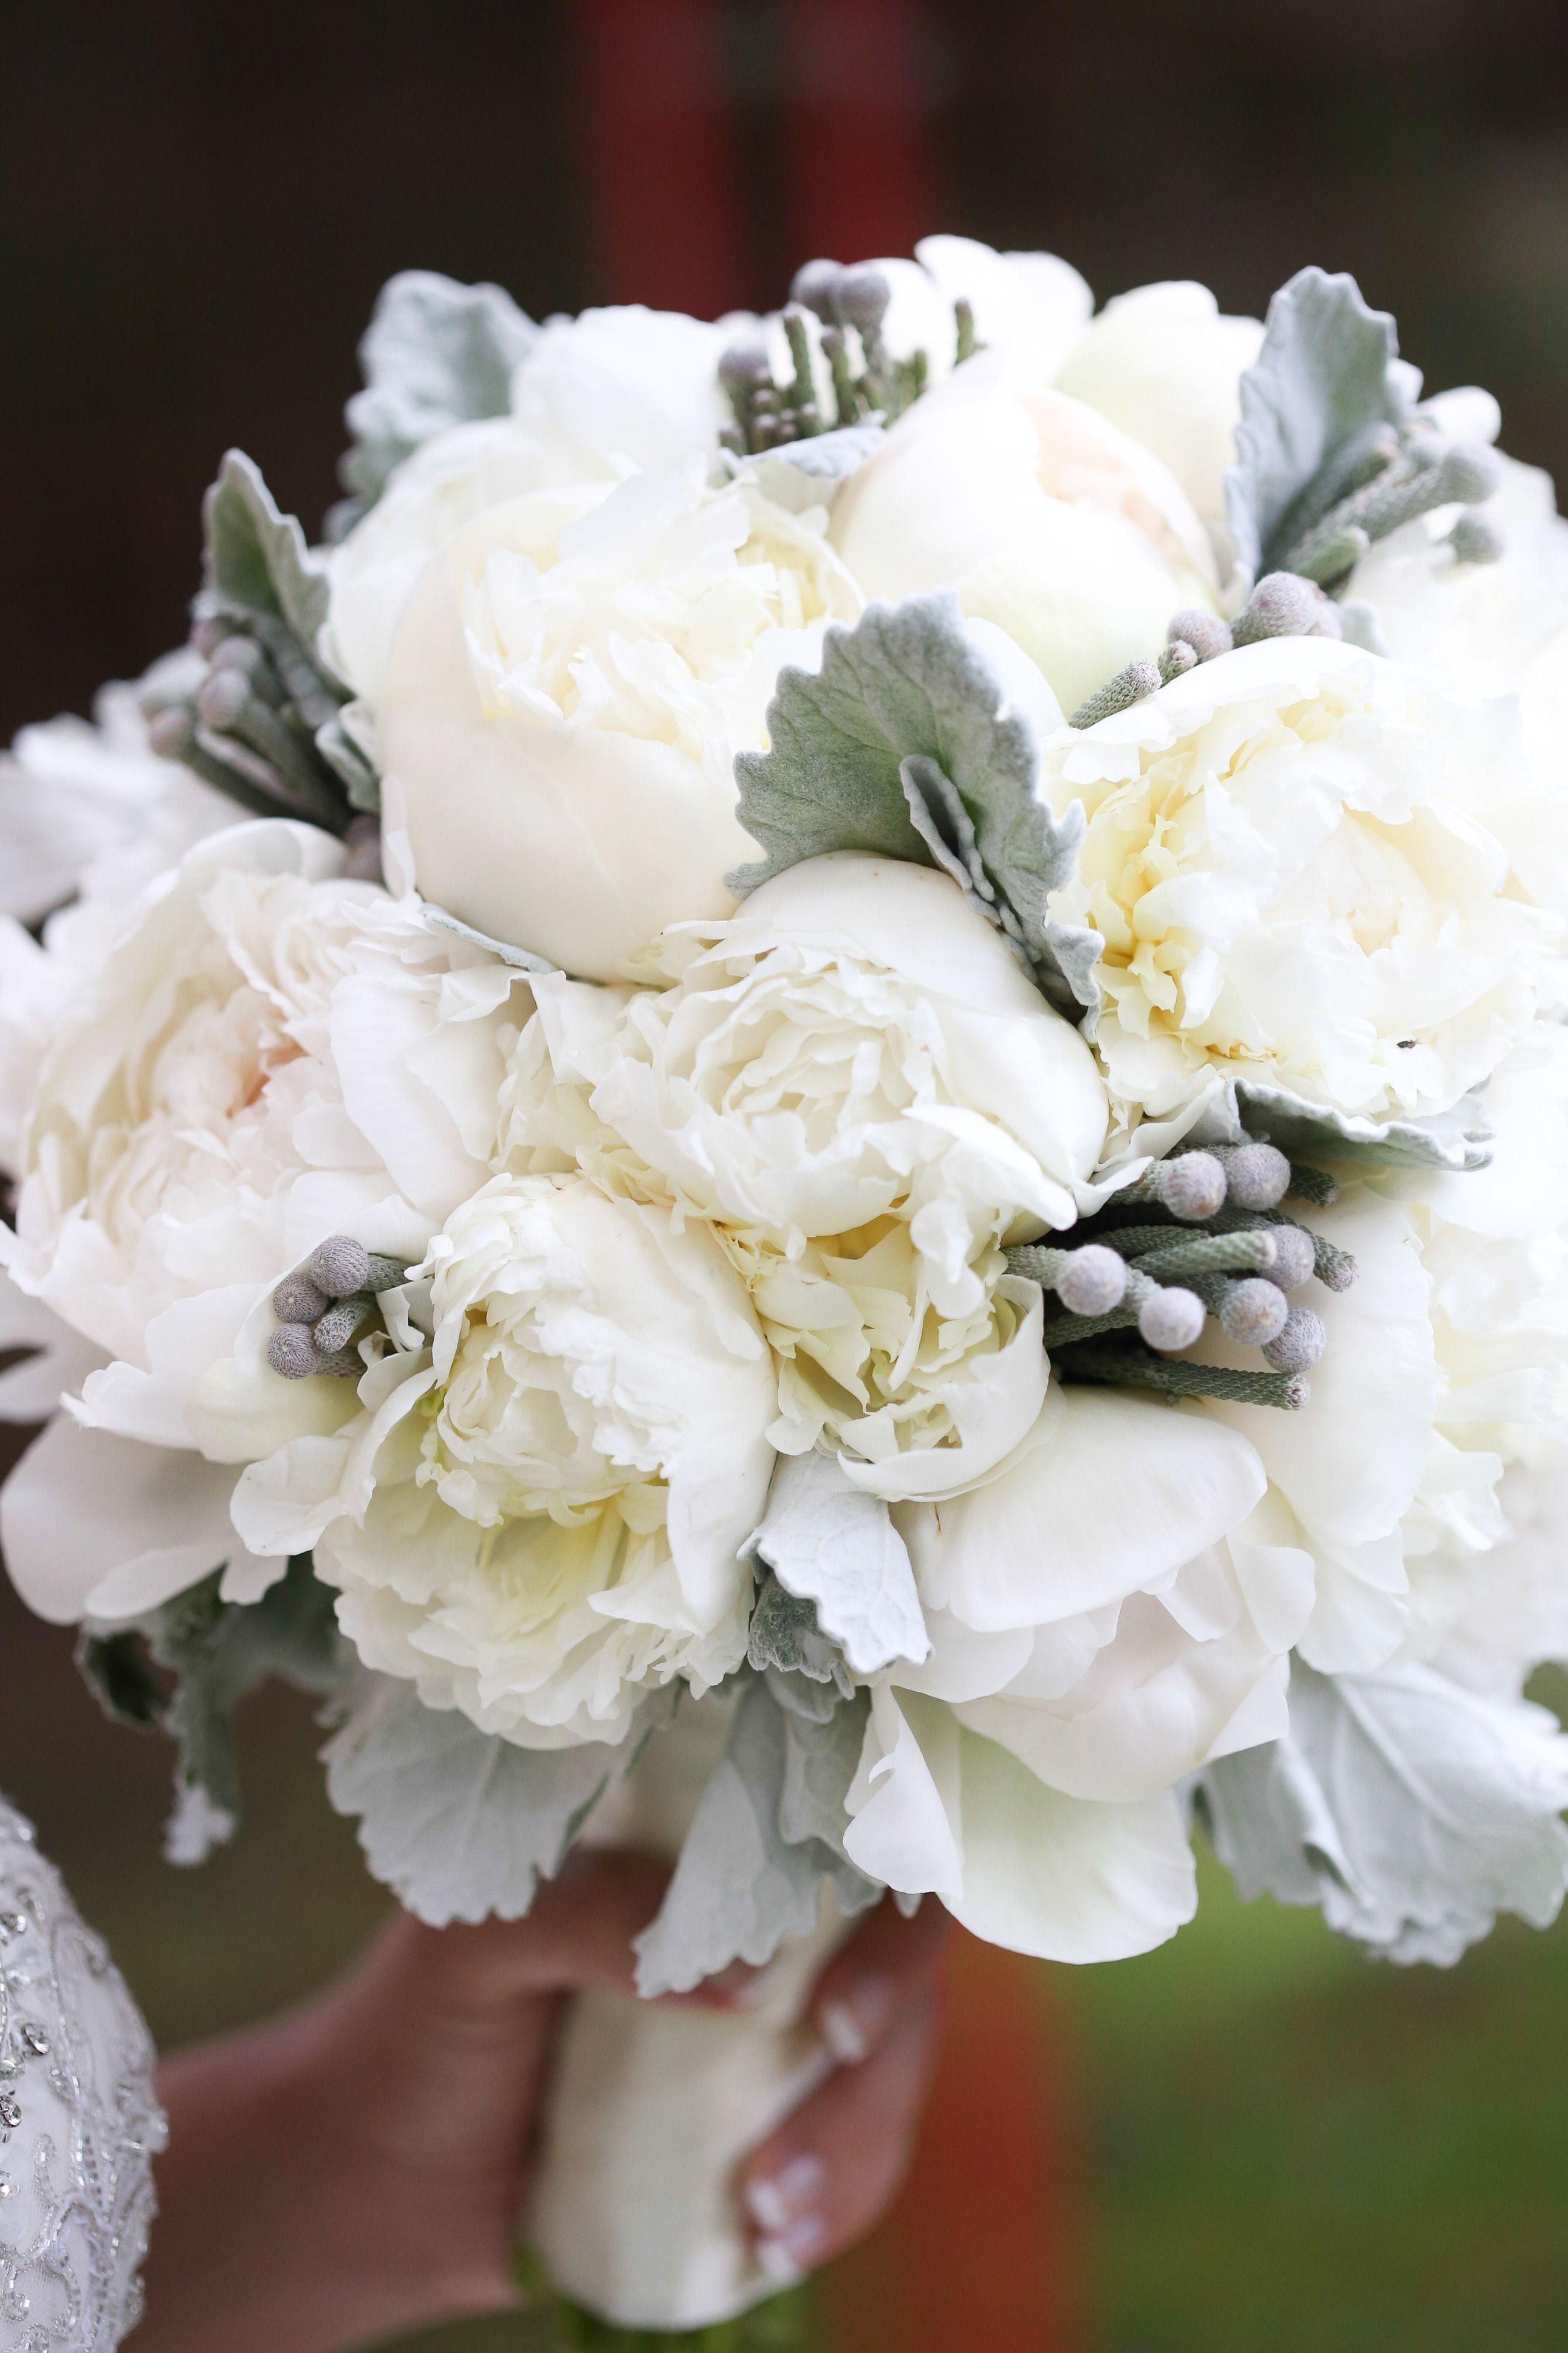 Creamy White Peony #Bouquet | See the wedding on SMP - http://www.StyleMePretty.com/canada-weddings/alberta/edmonton/2014/01/08/glamorous-garden-wedding-at-the-fairmont-hotel-macdonald/ Photography by Benamoz Ltd.